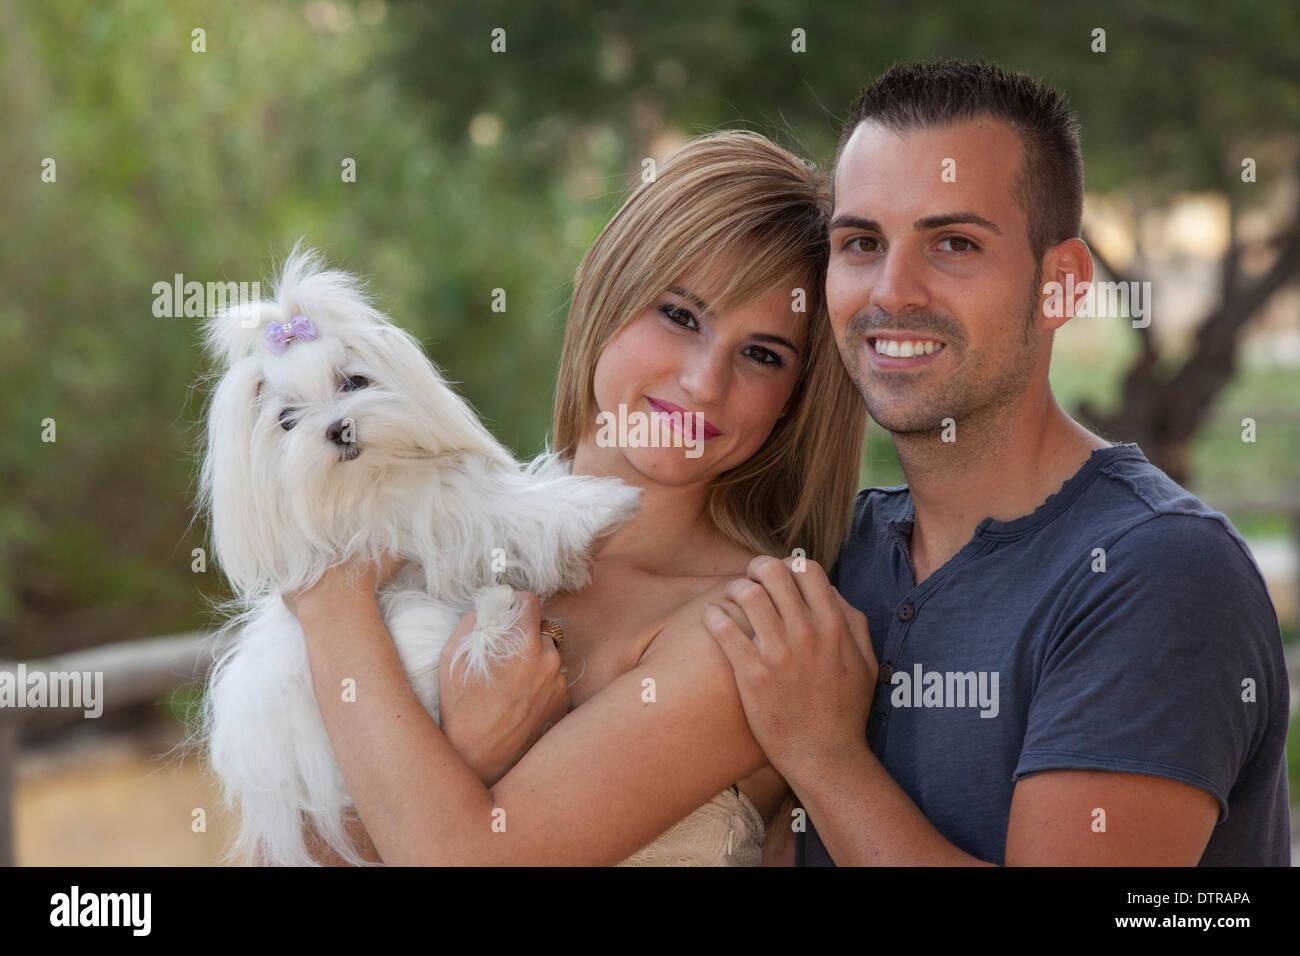 family pet Maltese dog - Stock Image